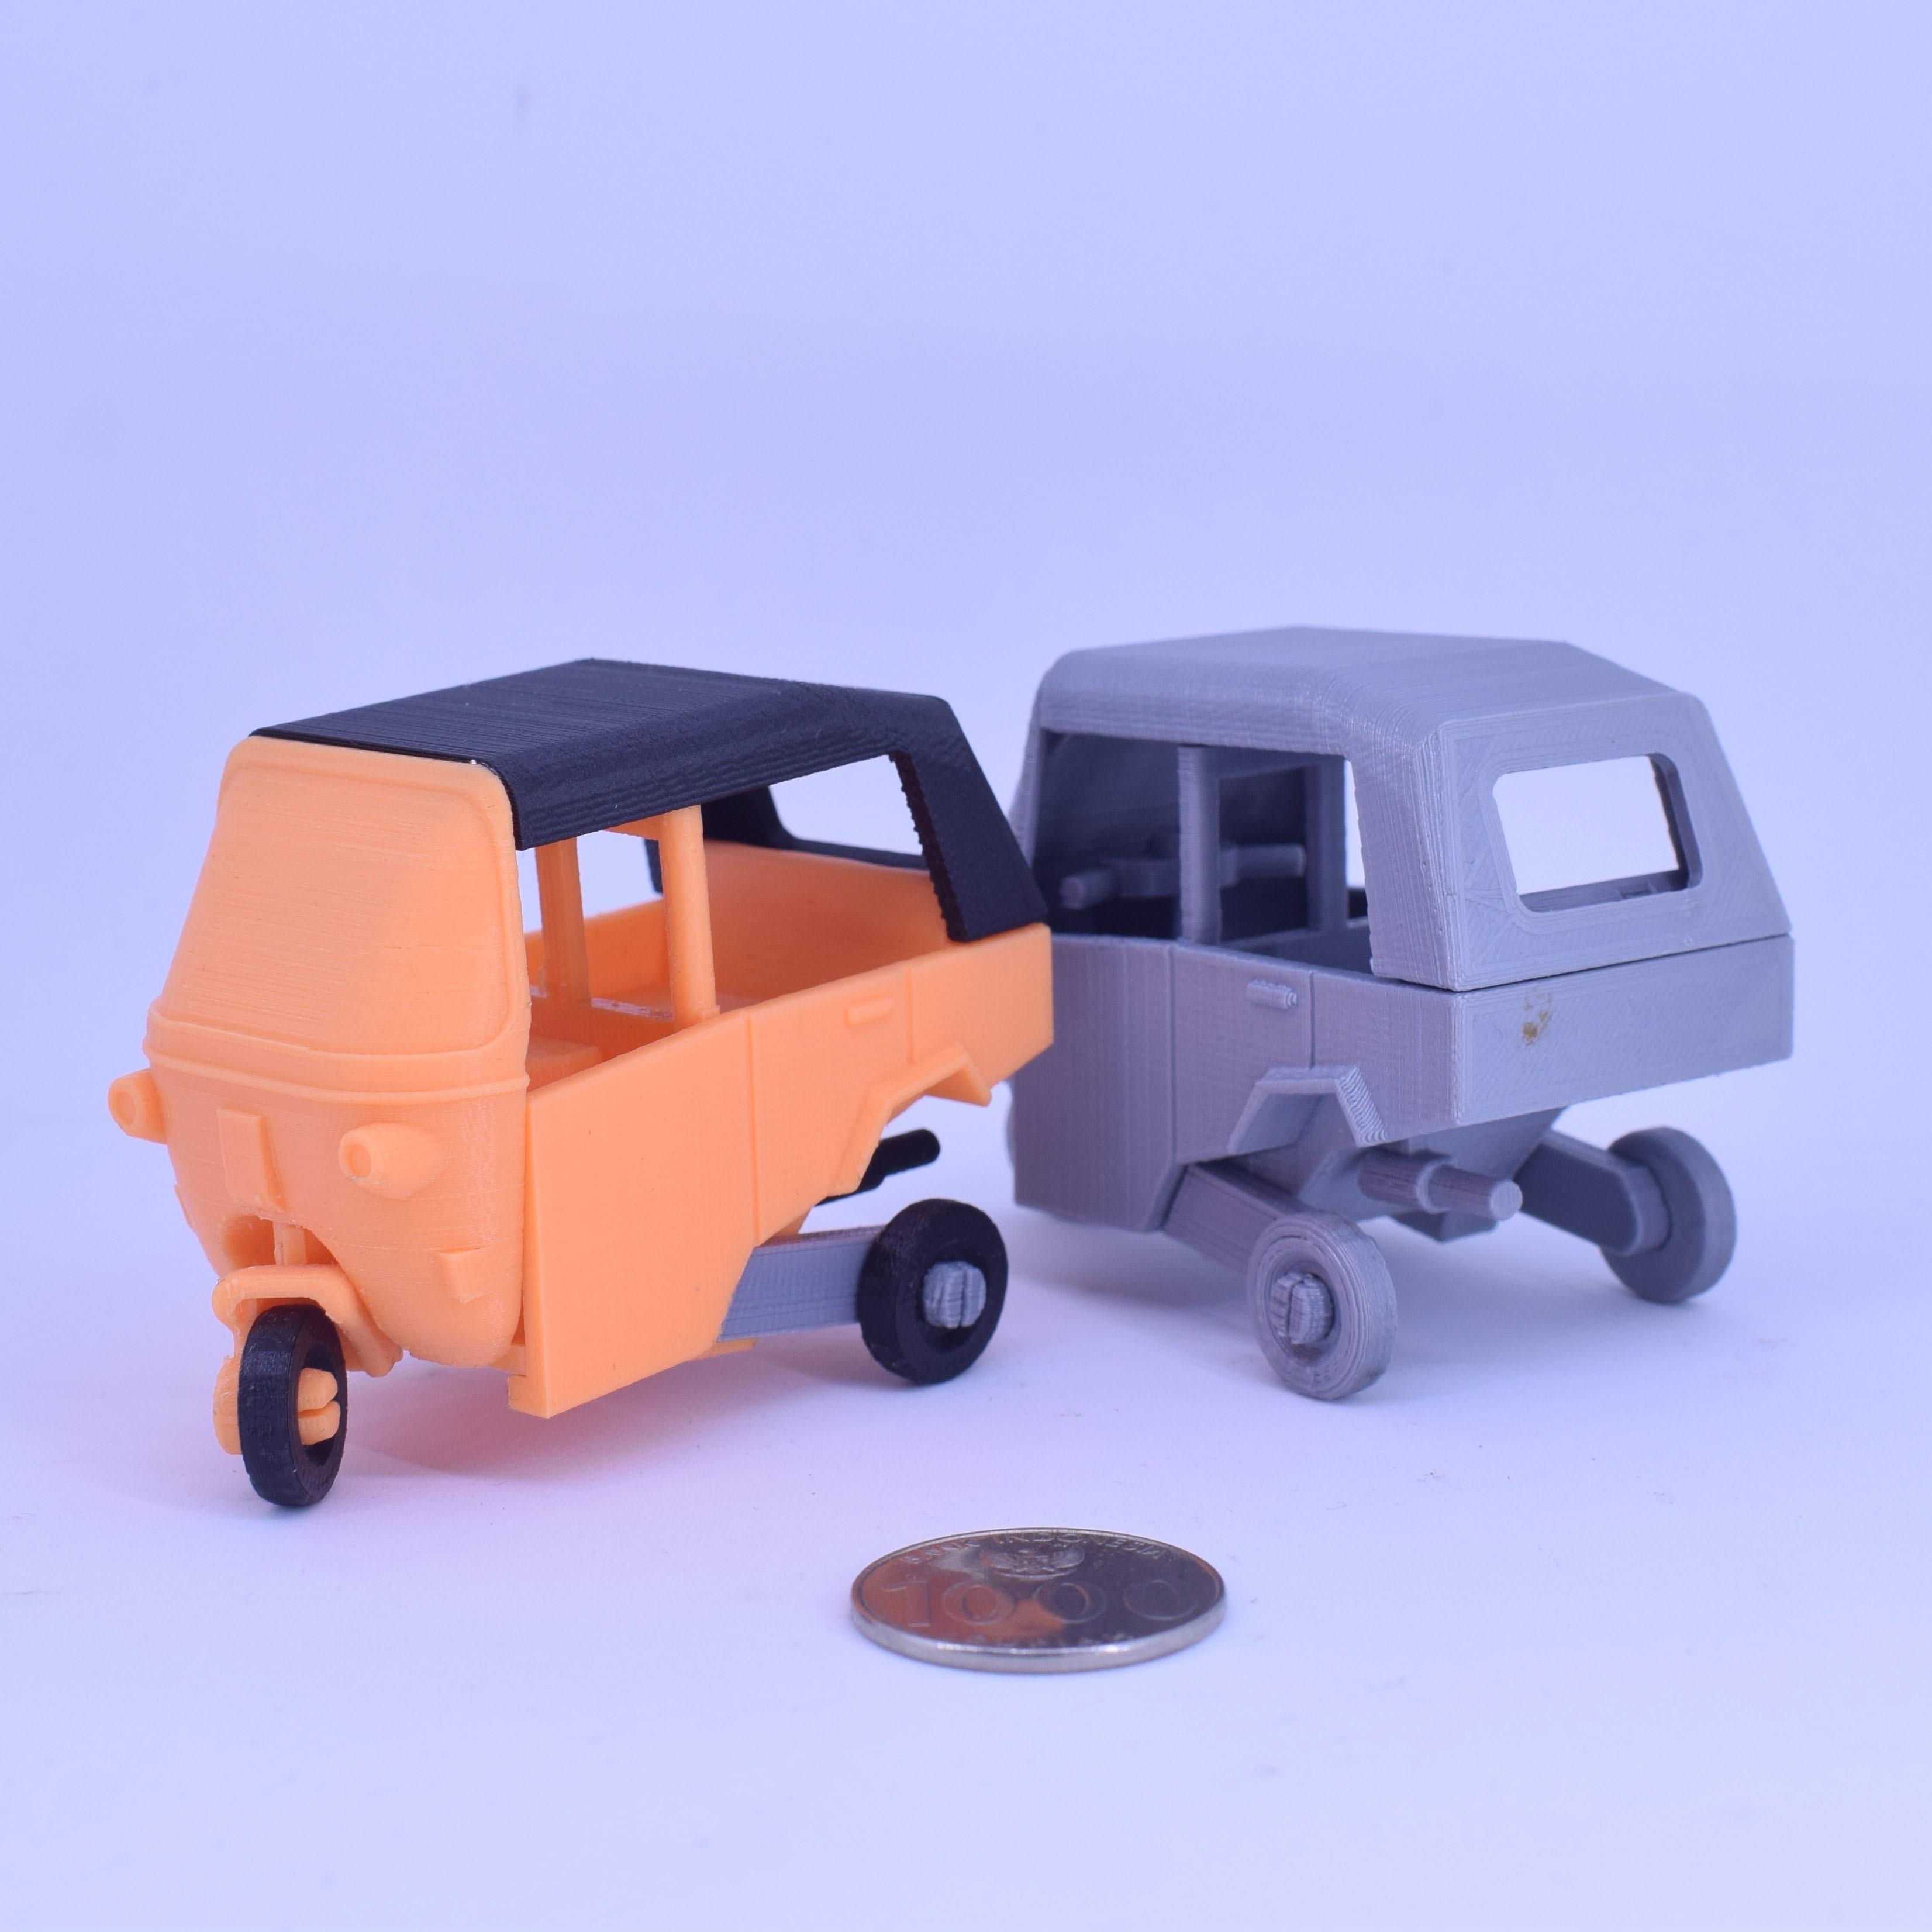 1cults3D.jpg Download free STL file Classic 3 Wheels Car no support • Design to 3D print, Toymakr3D